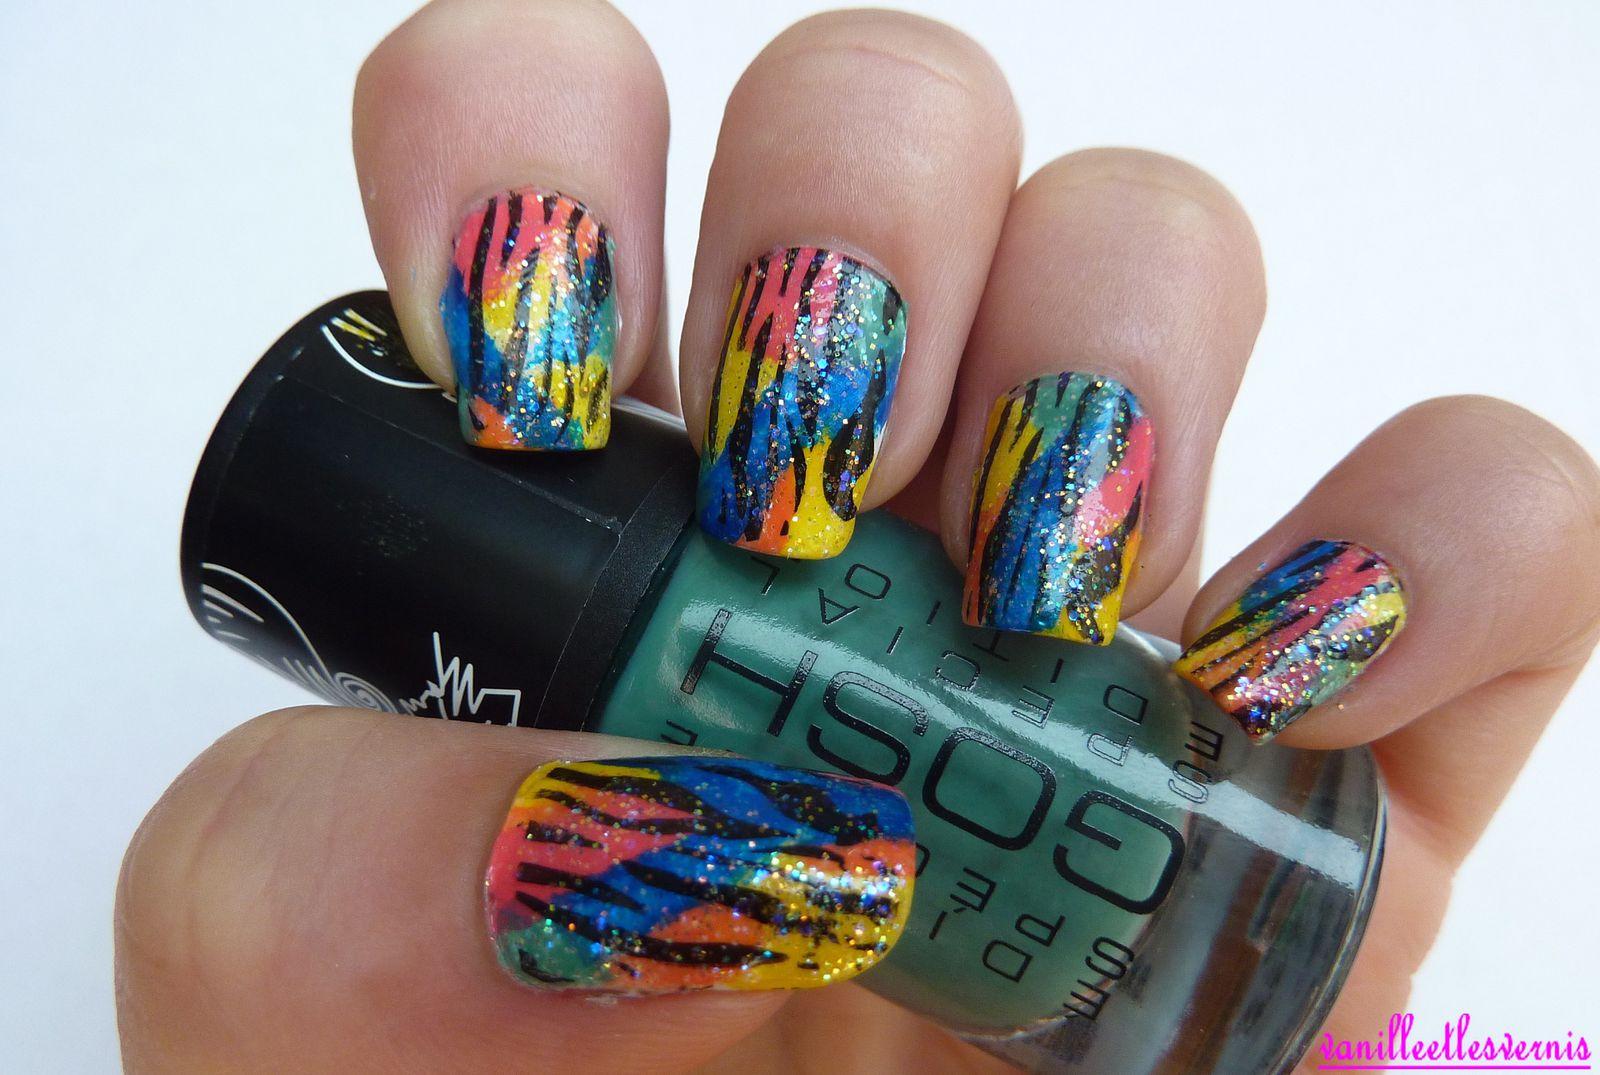 Nail Art, spécial catch!!!!